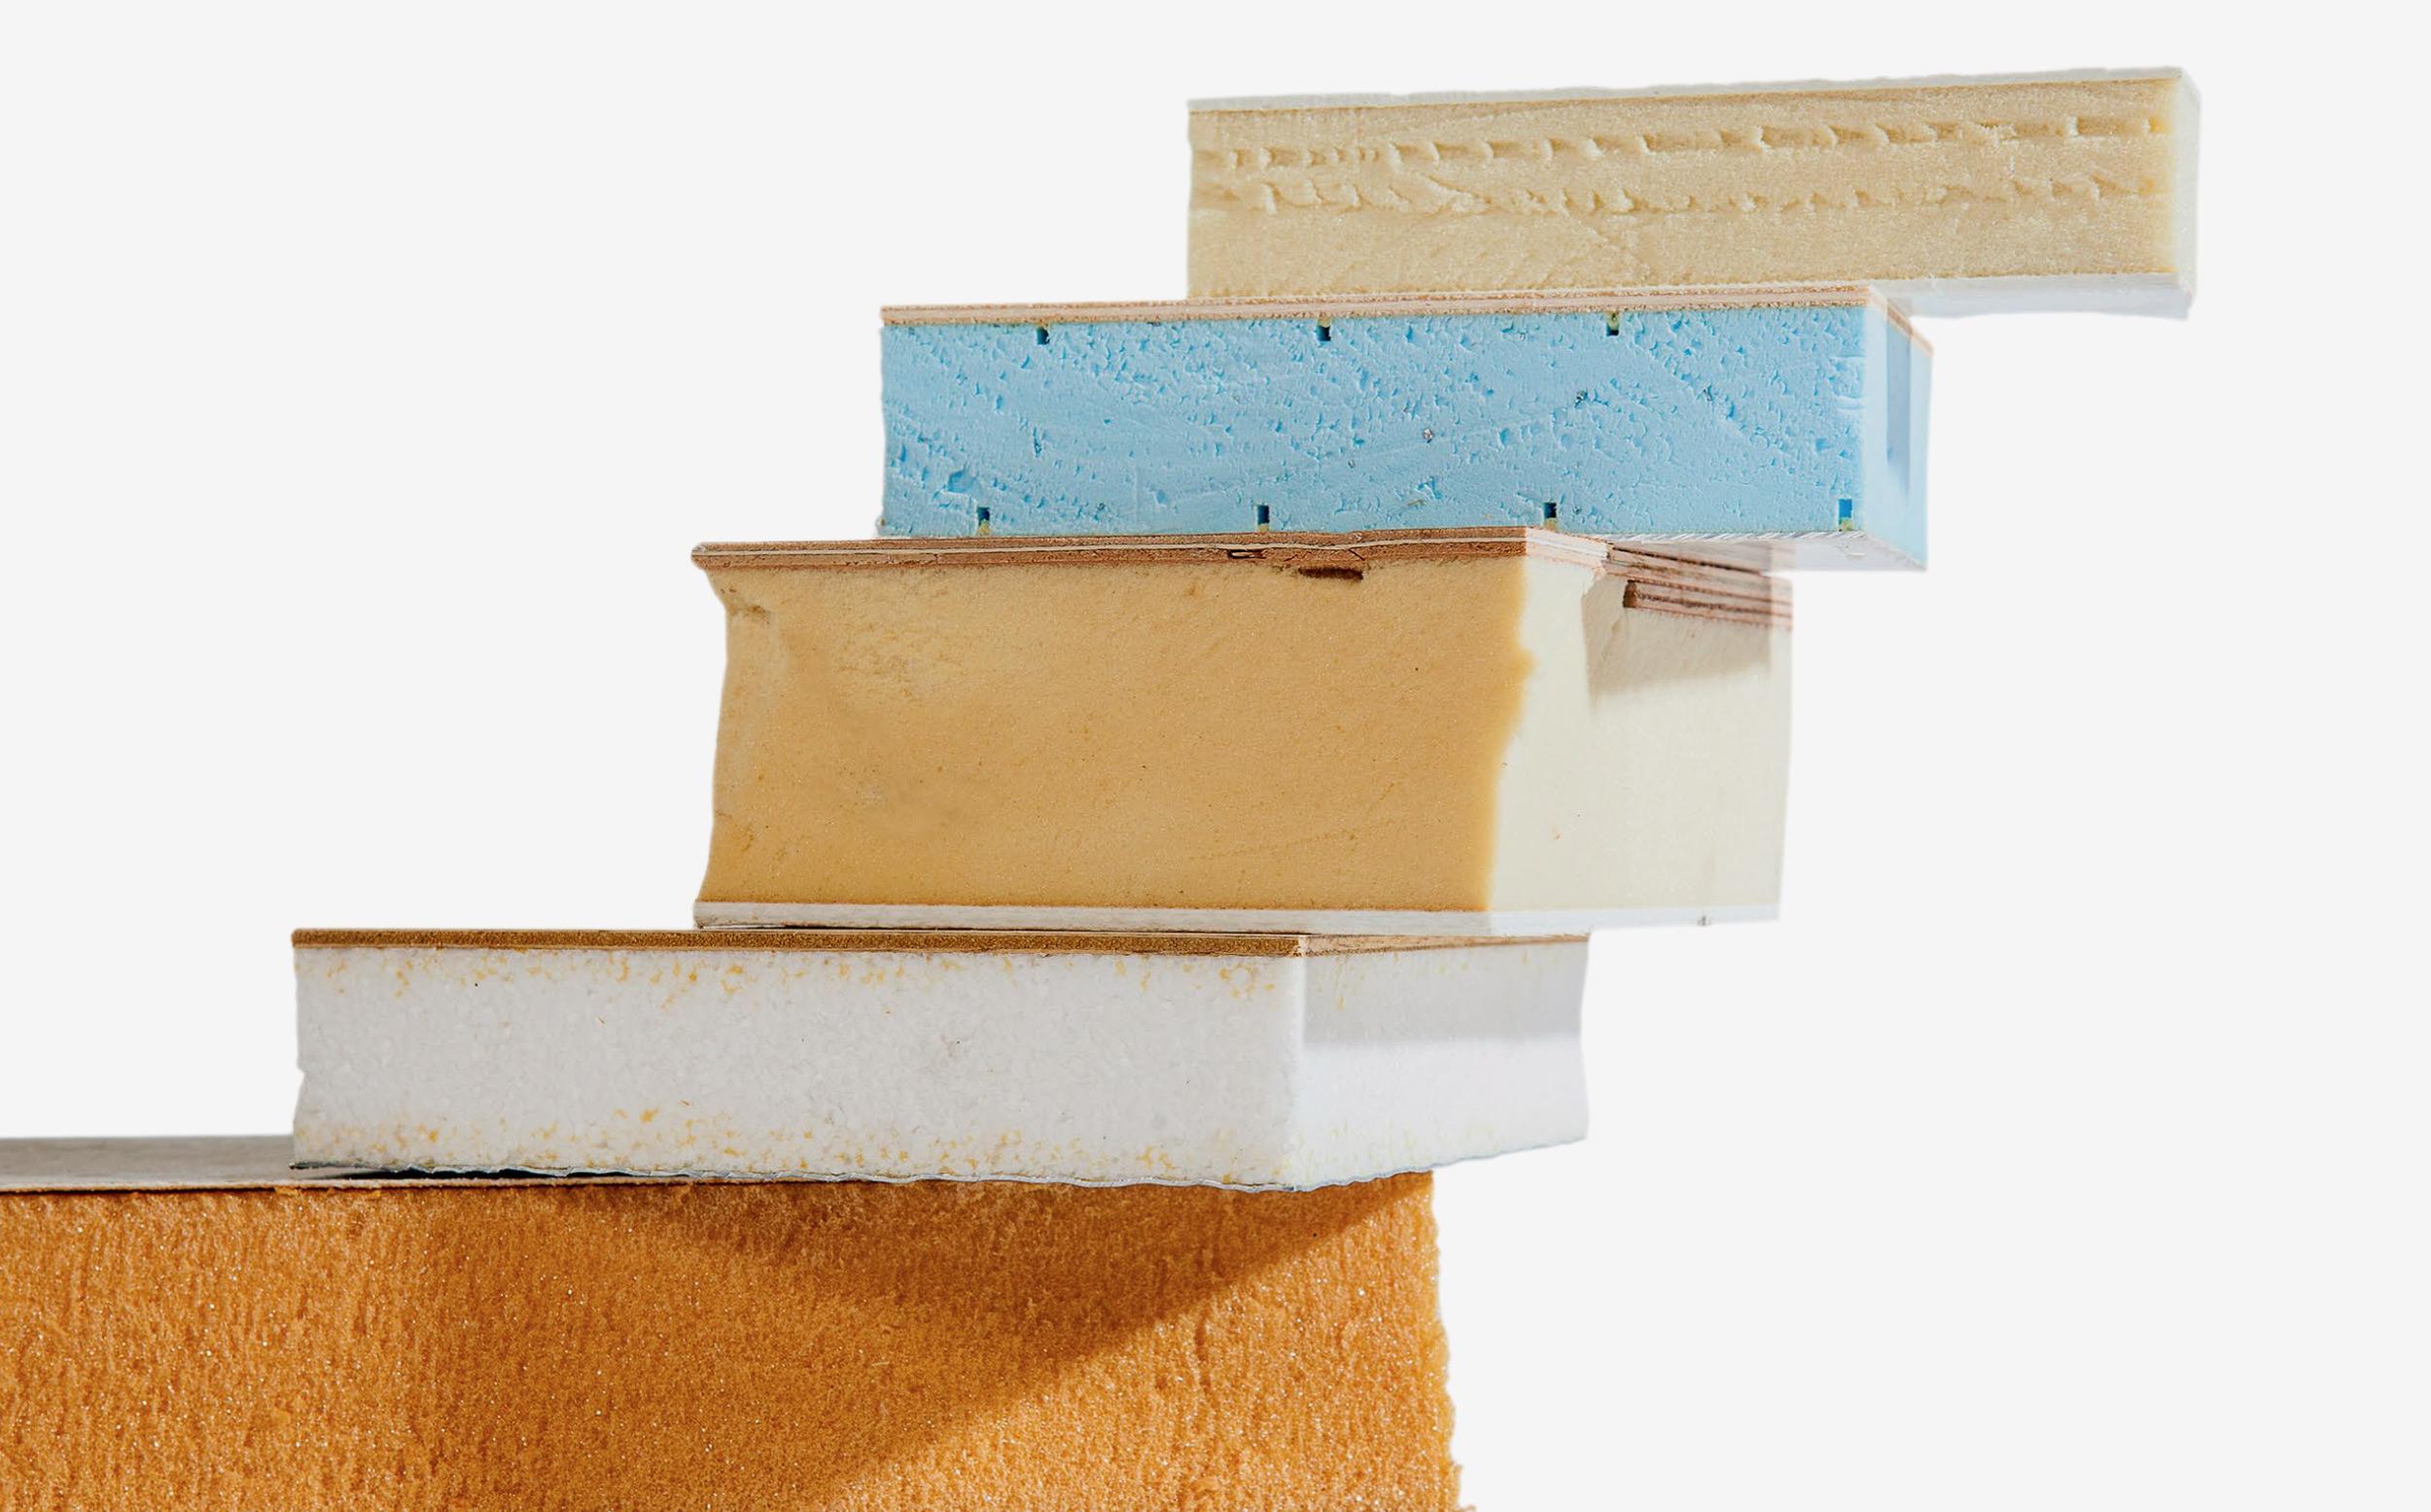 leerkabinen hersteller im berblick explorer. Black Bedroom Furniture Sets. Home Design Ideas